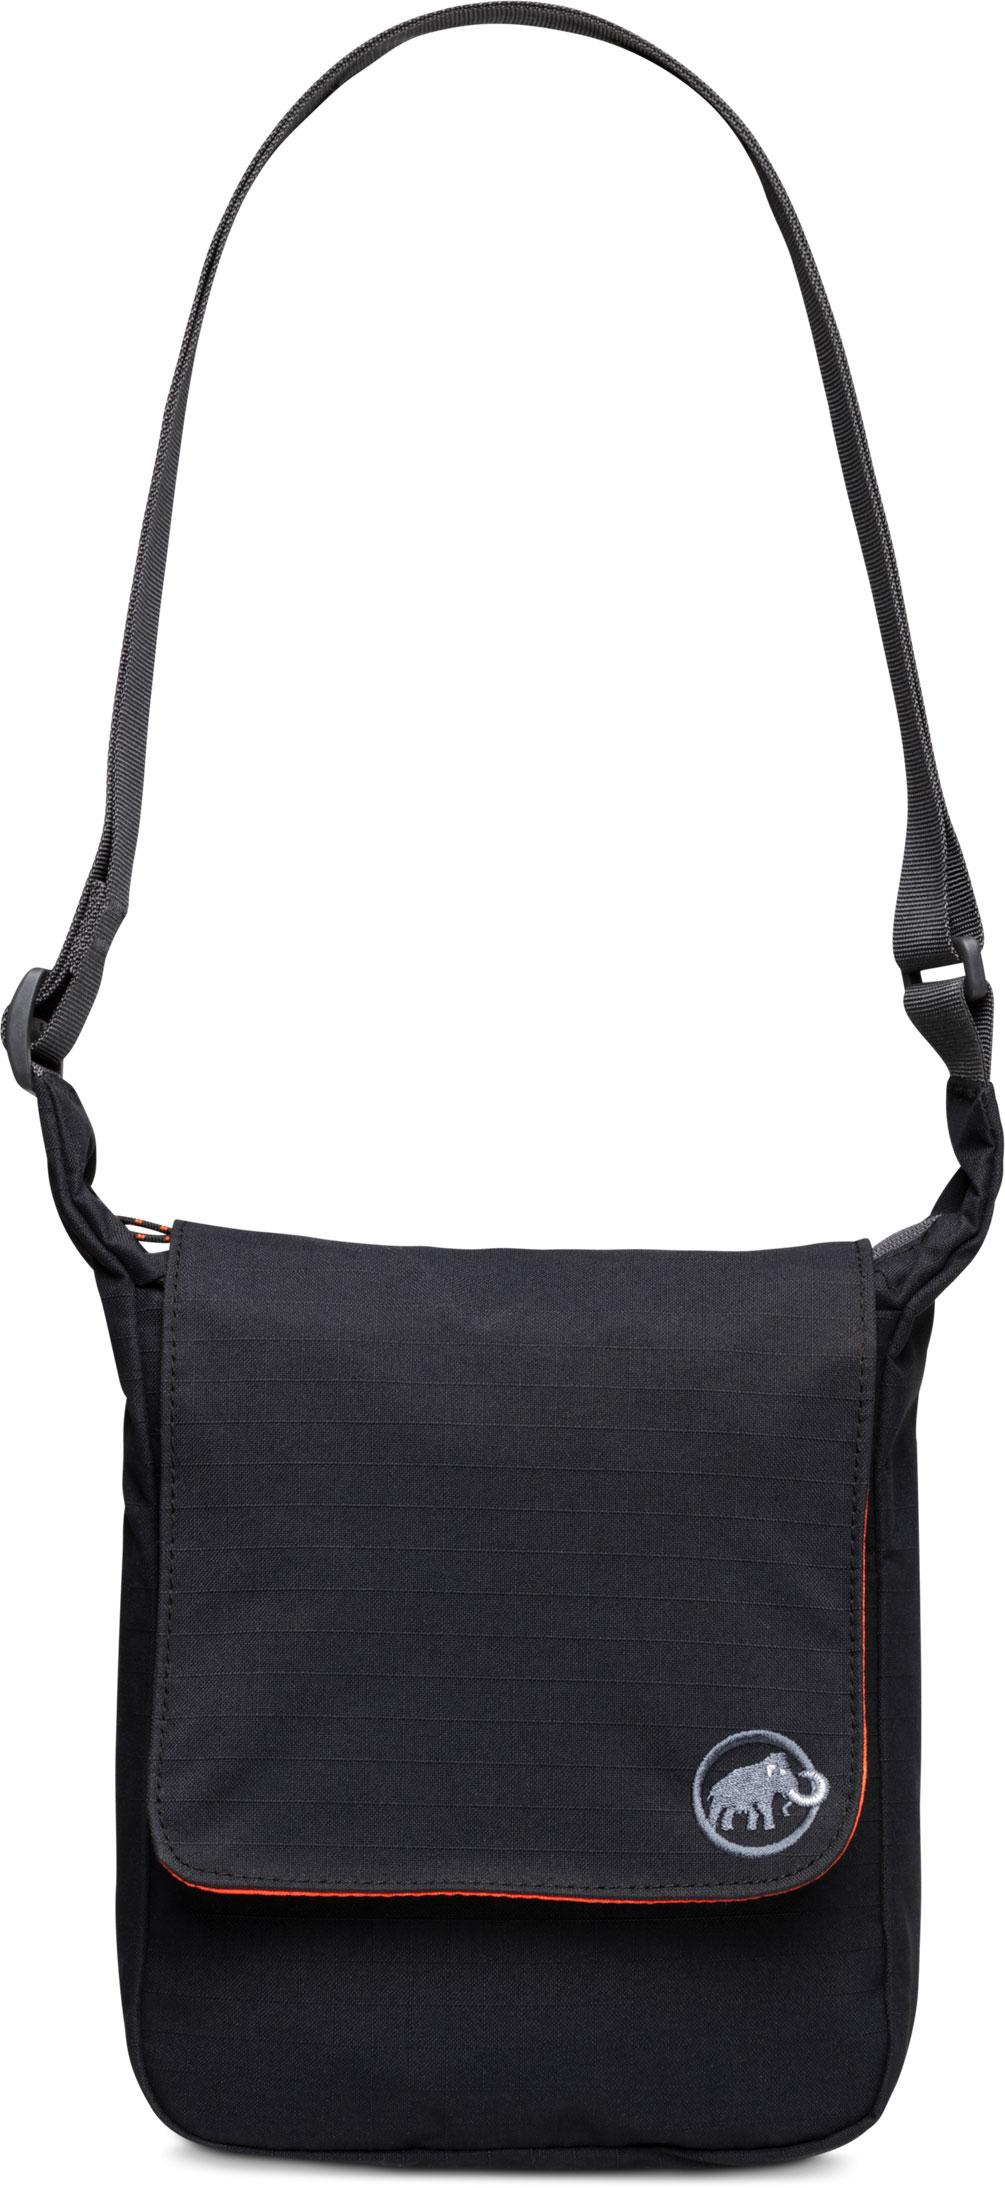 5d8ba2c2c Mammut Shoulder Bag Square 8, 4 - Mammut travel bag and more at ...